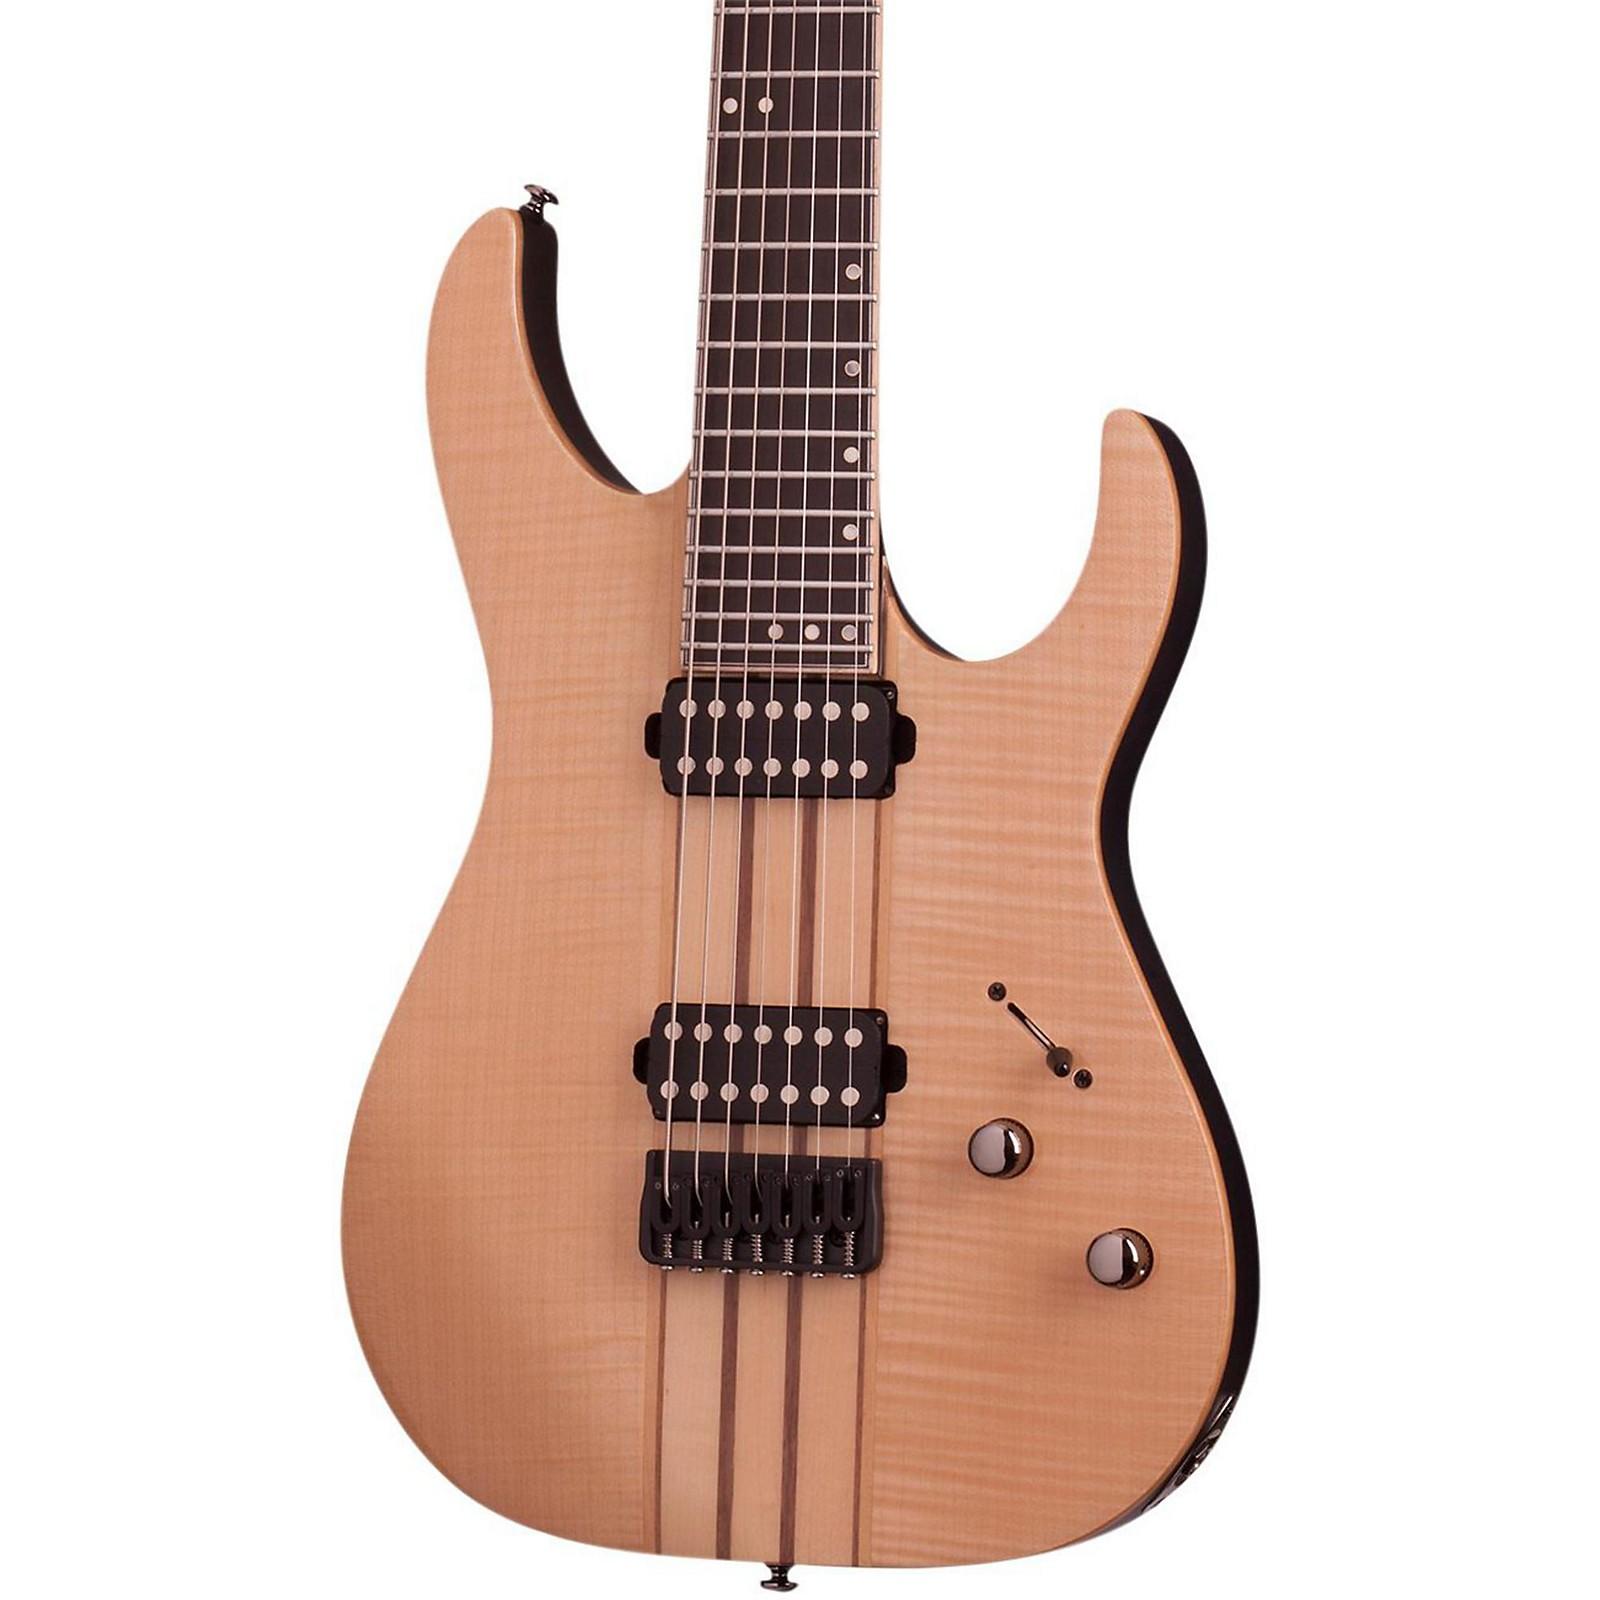 Schecter Guitar Research Banshee Elite-7 Seven-String Electric Guitar